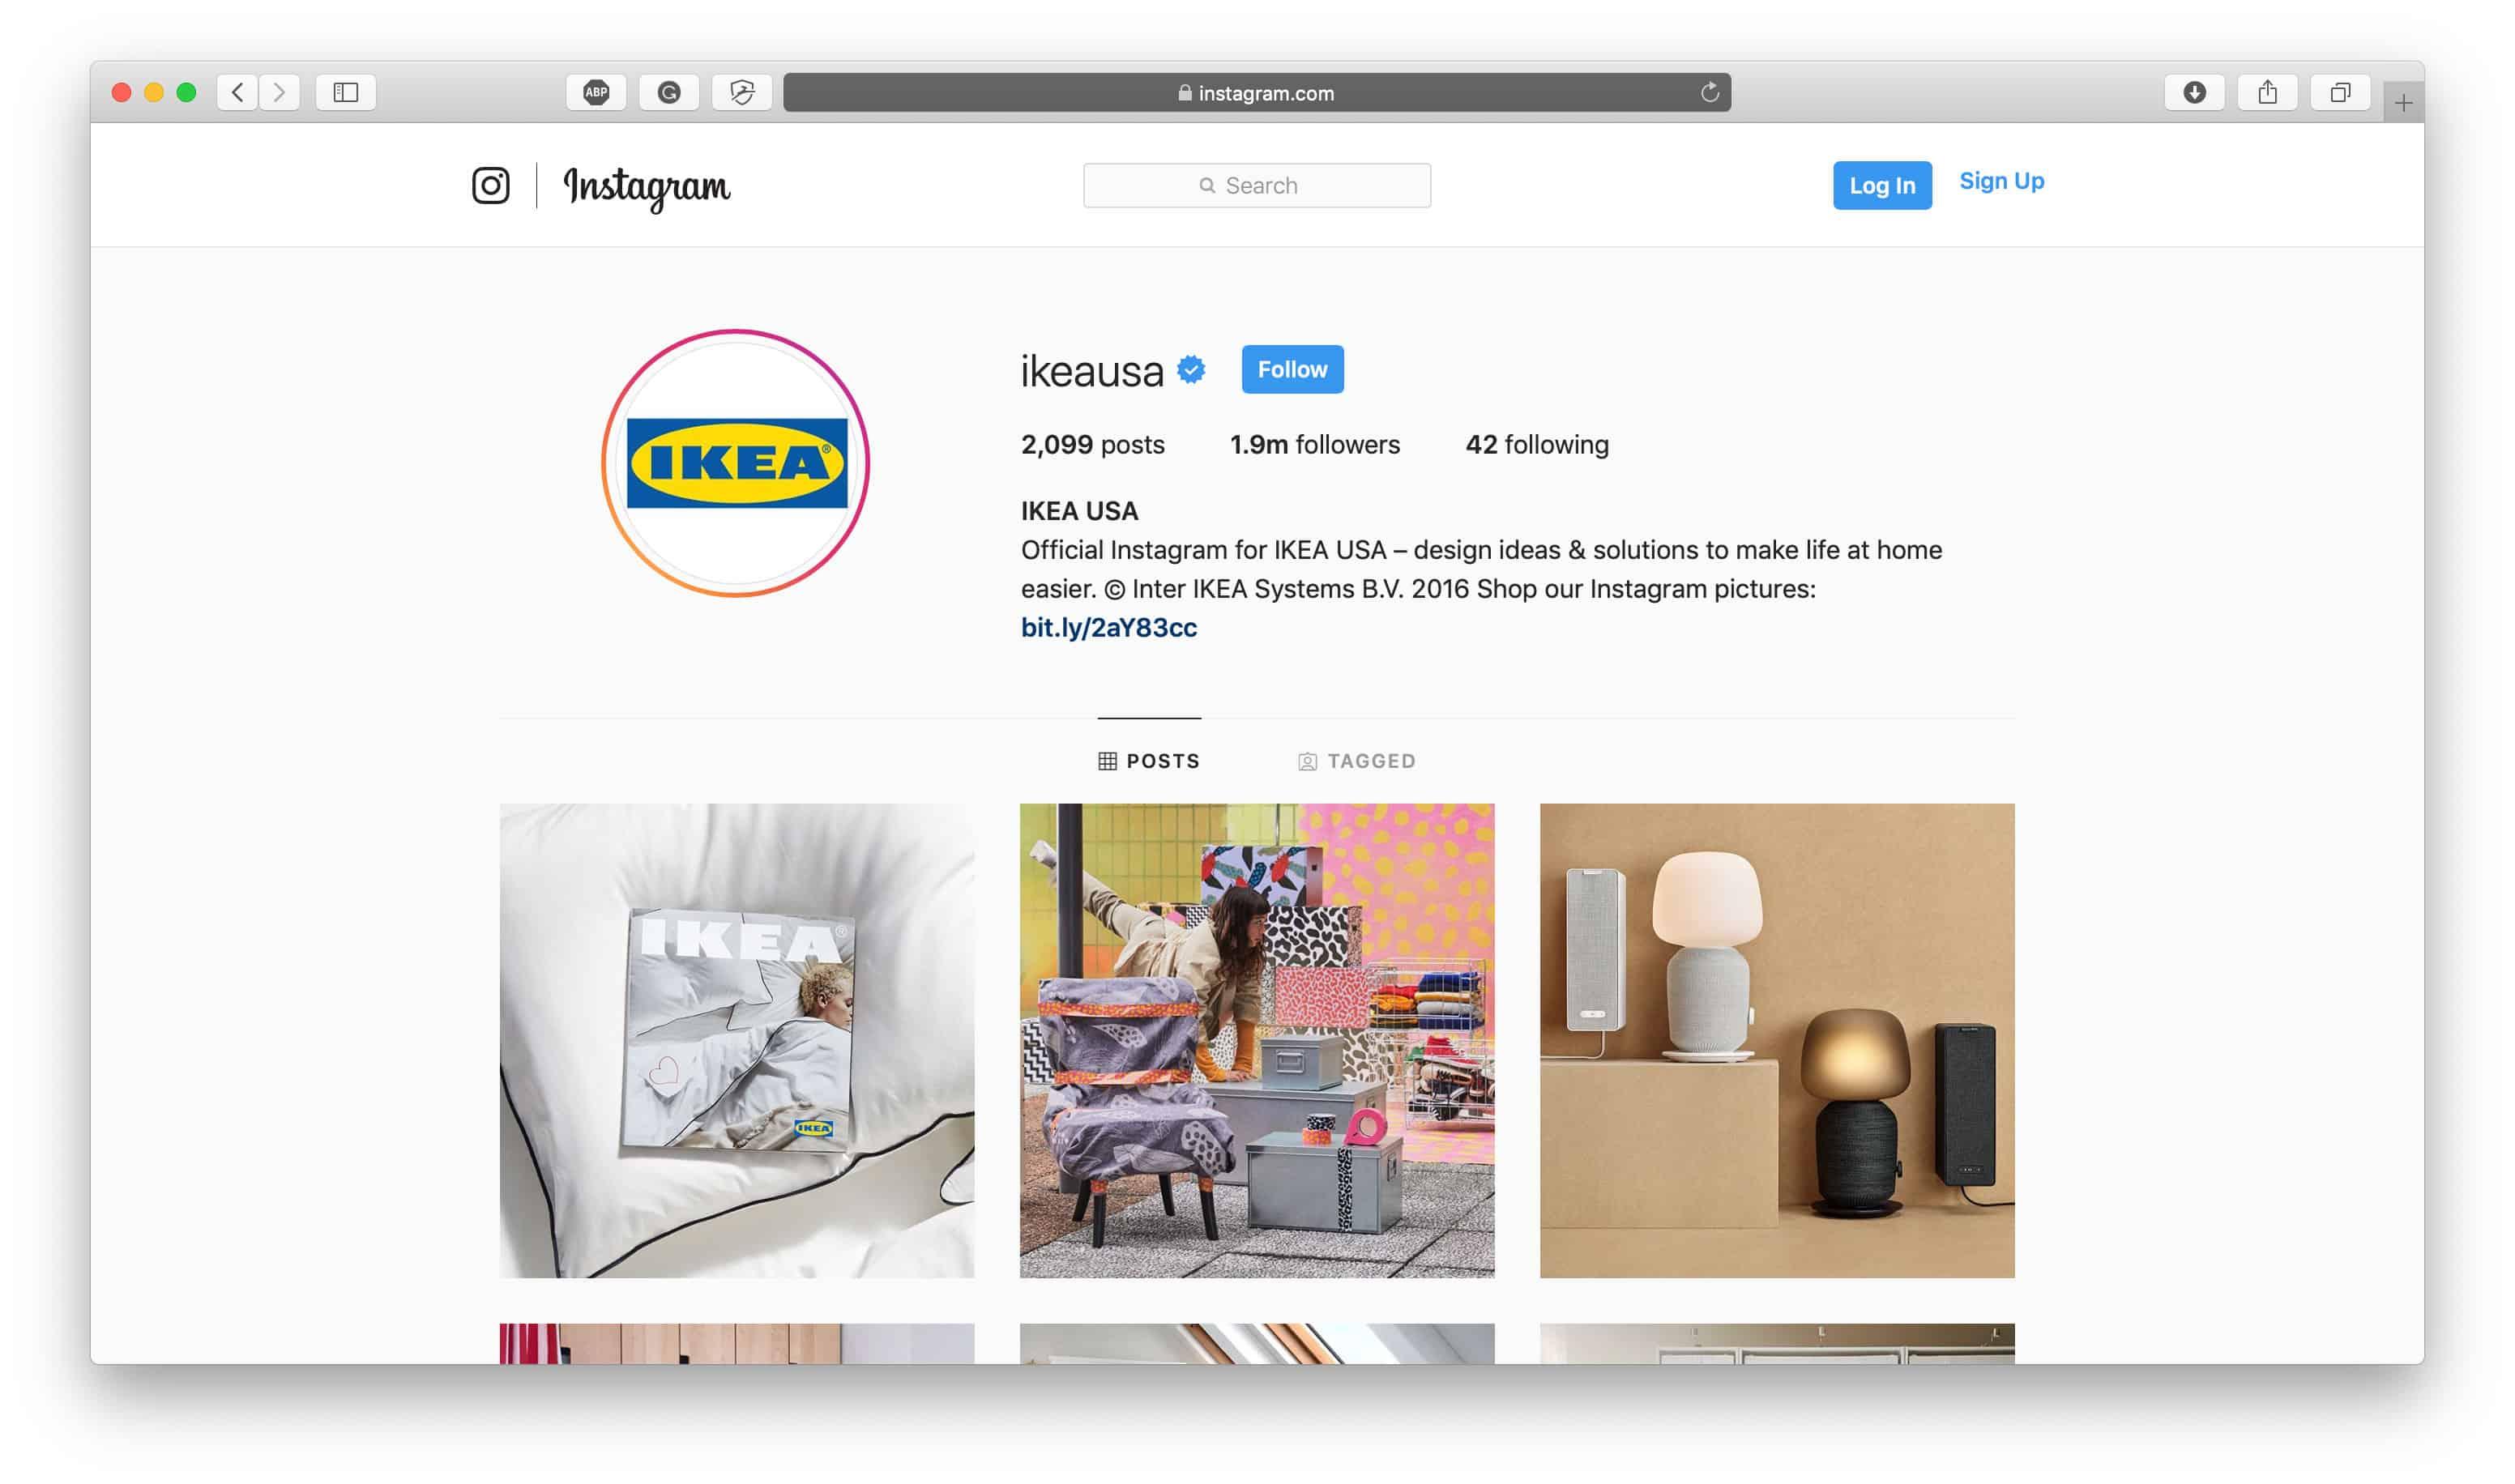 Ikea Instagram Bio Example